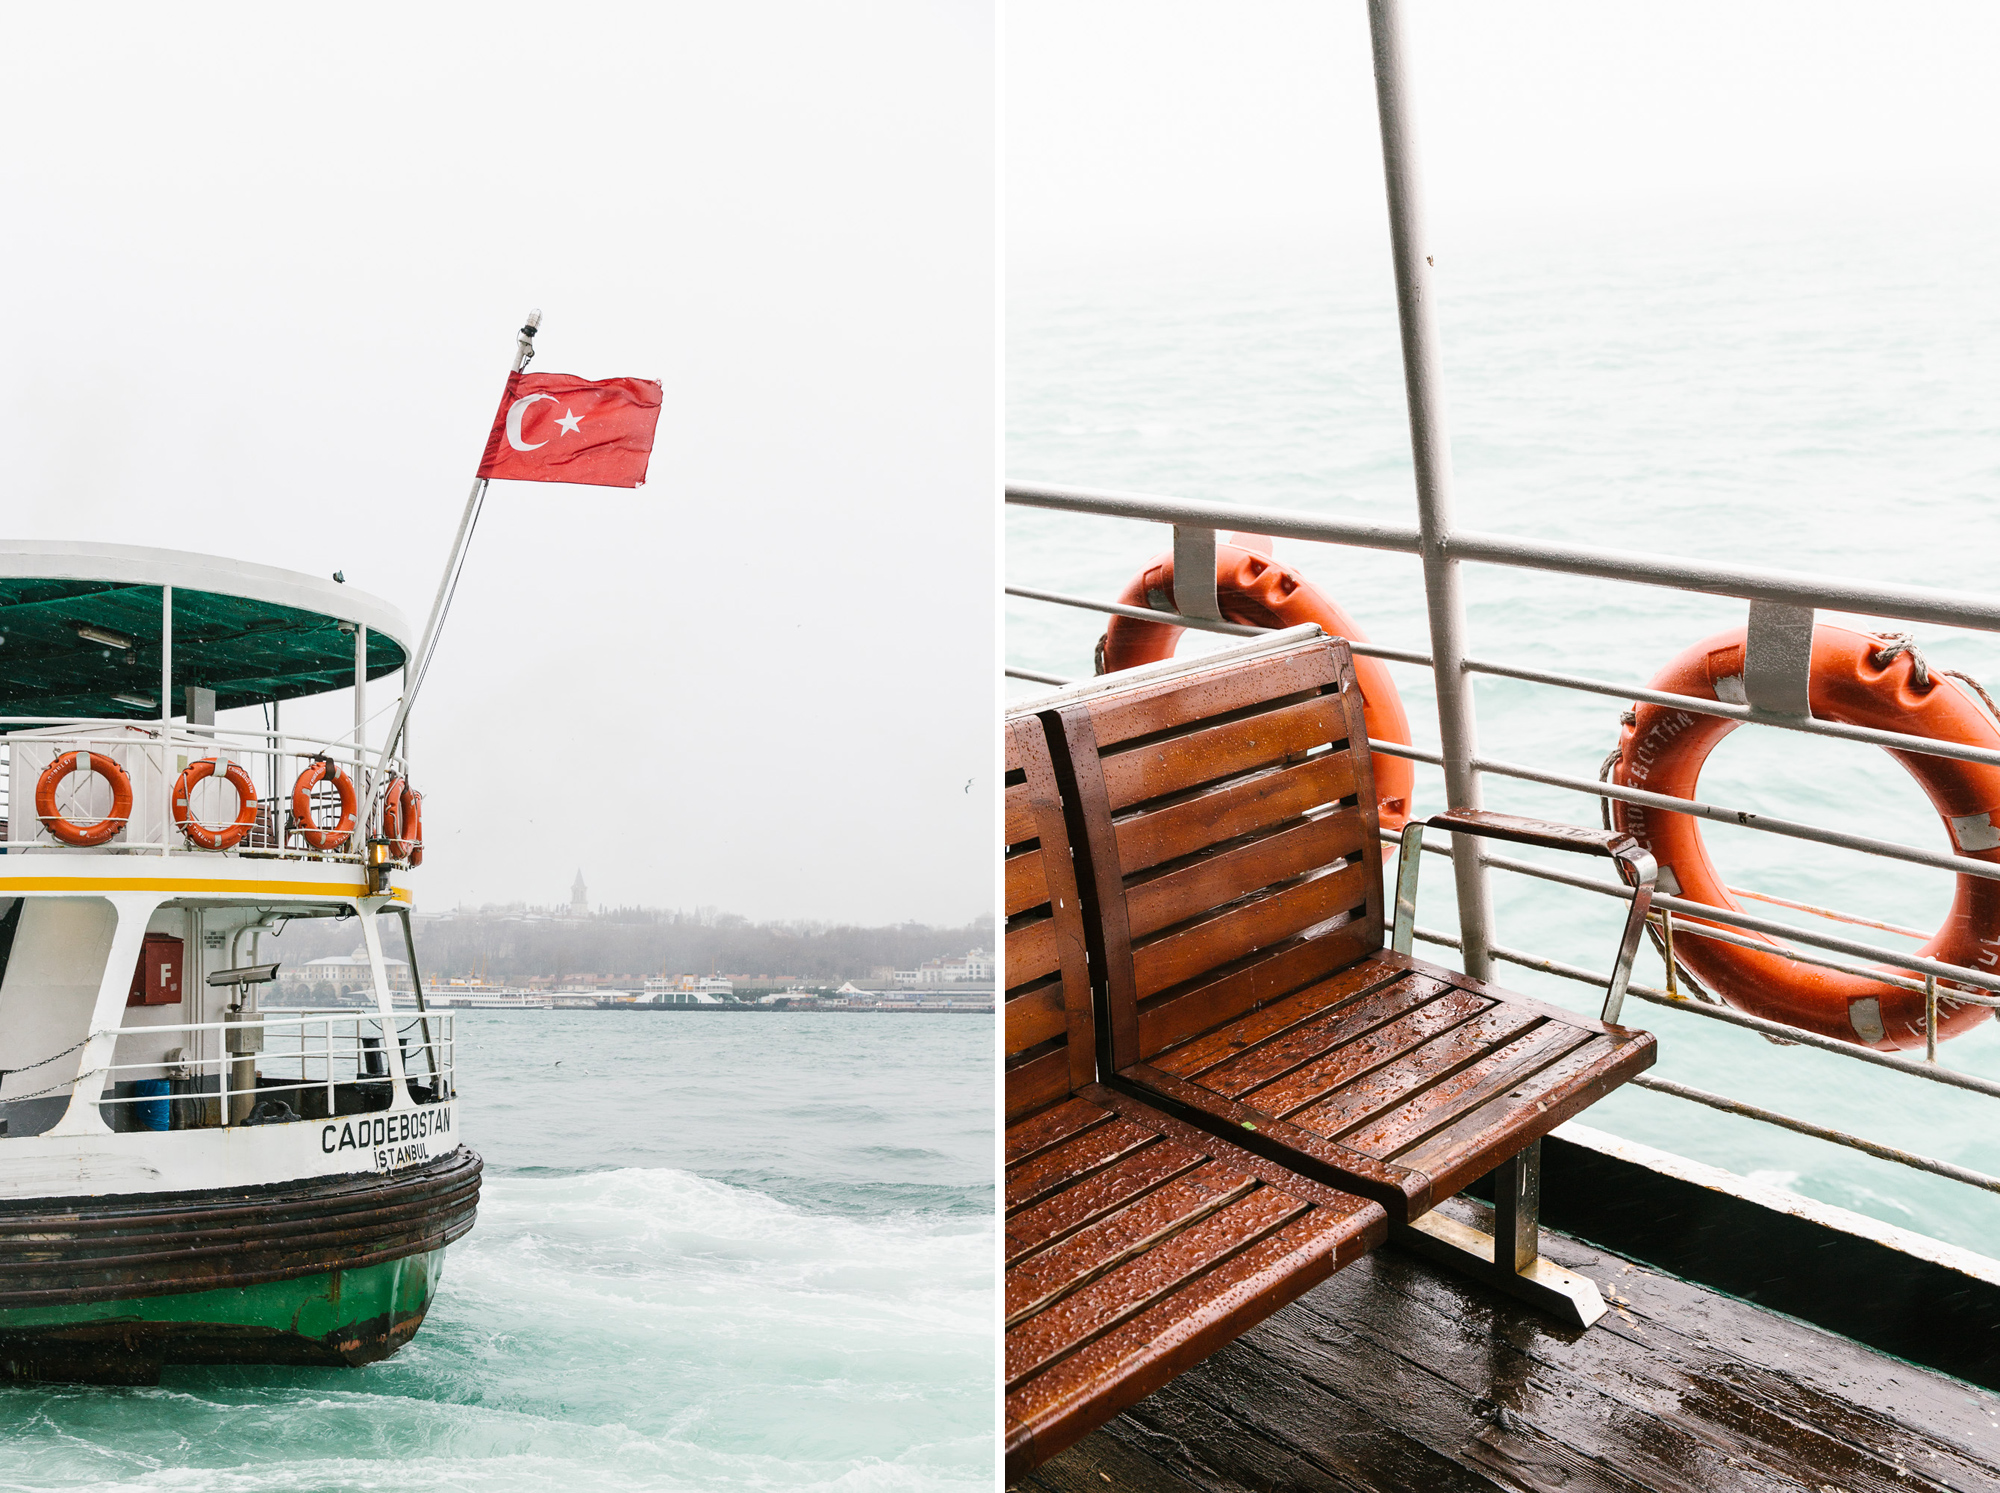 Istanbul_Bosphorus-AudiMagazine-FinnBeales-02.jpg